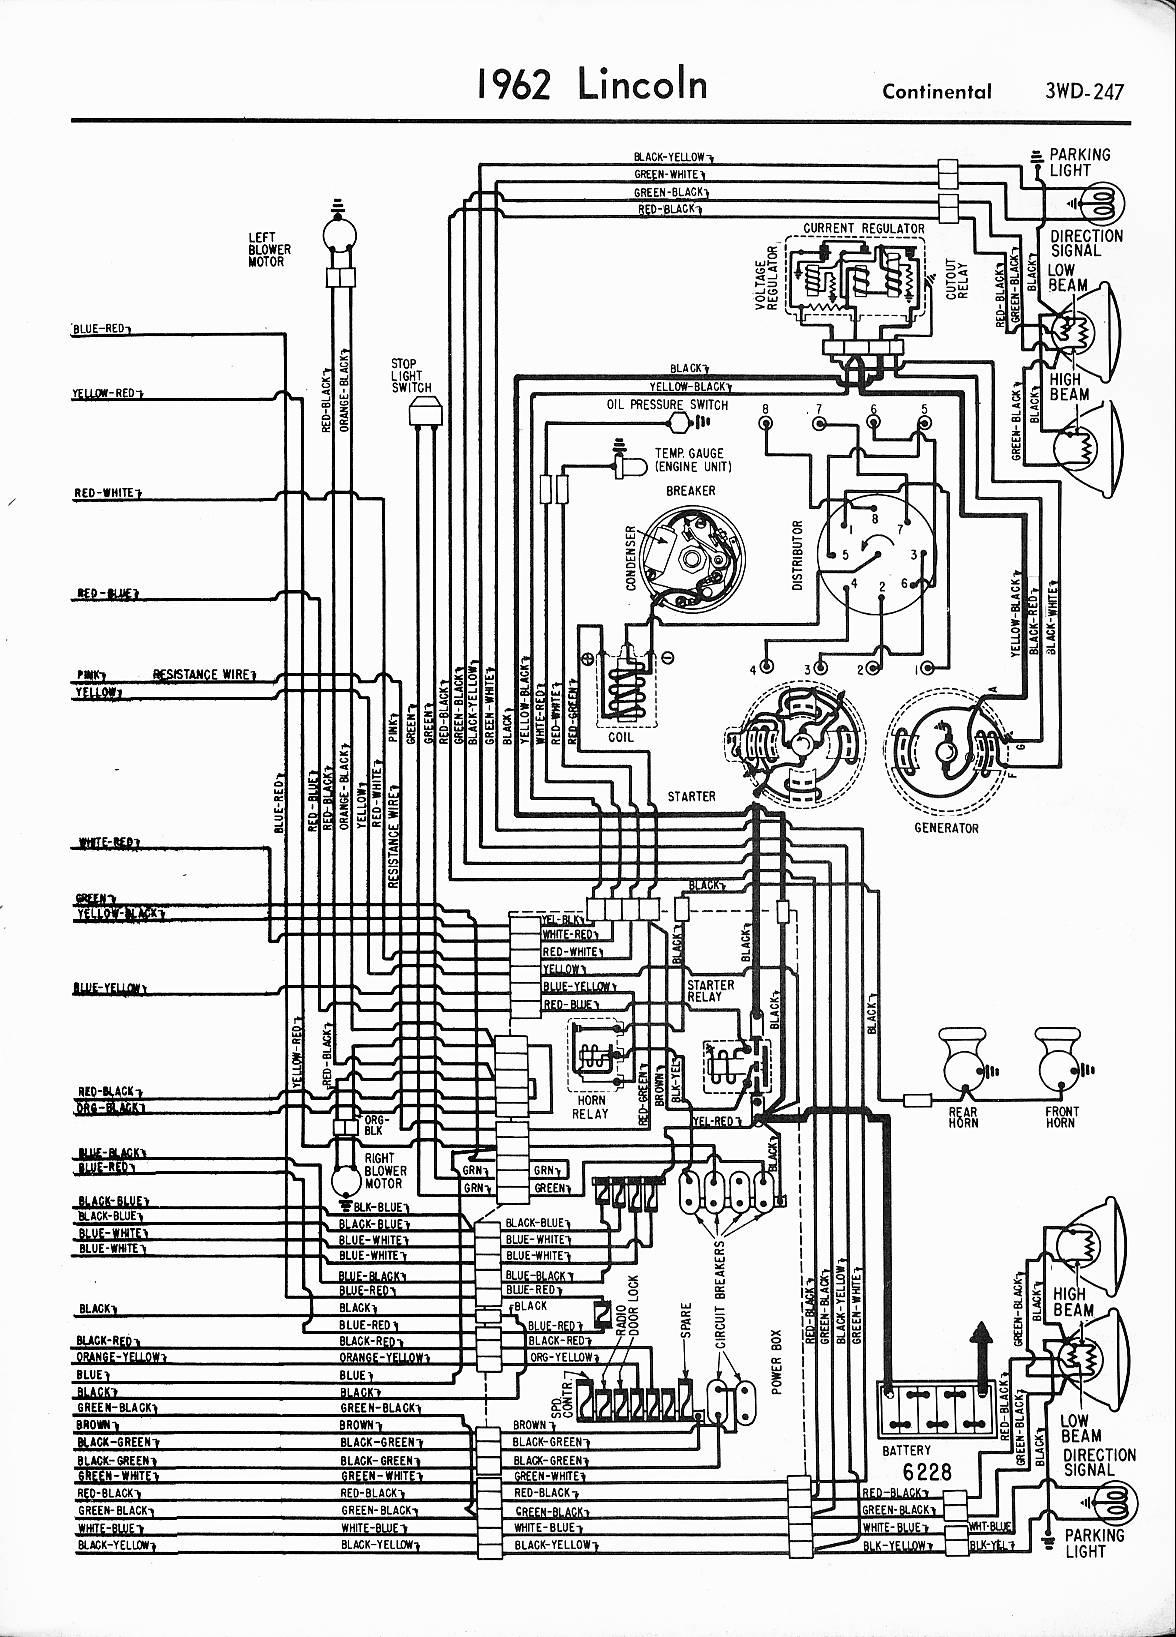 96 Jetta Engine Diagram - 2007 Vw Eos Fuse Diagram for Wiring Diagram  SchematicsWiring Diagram Schematics